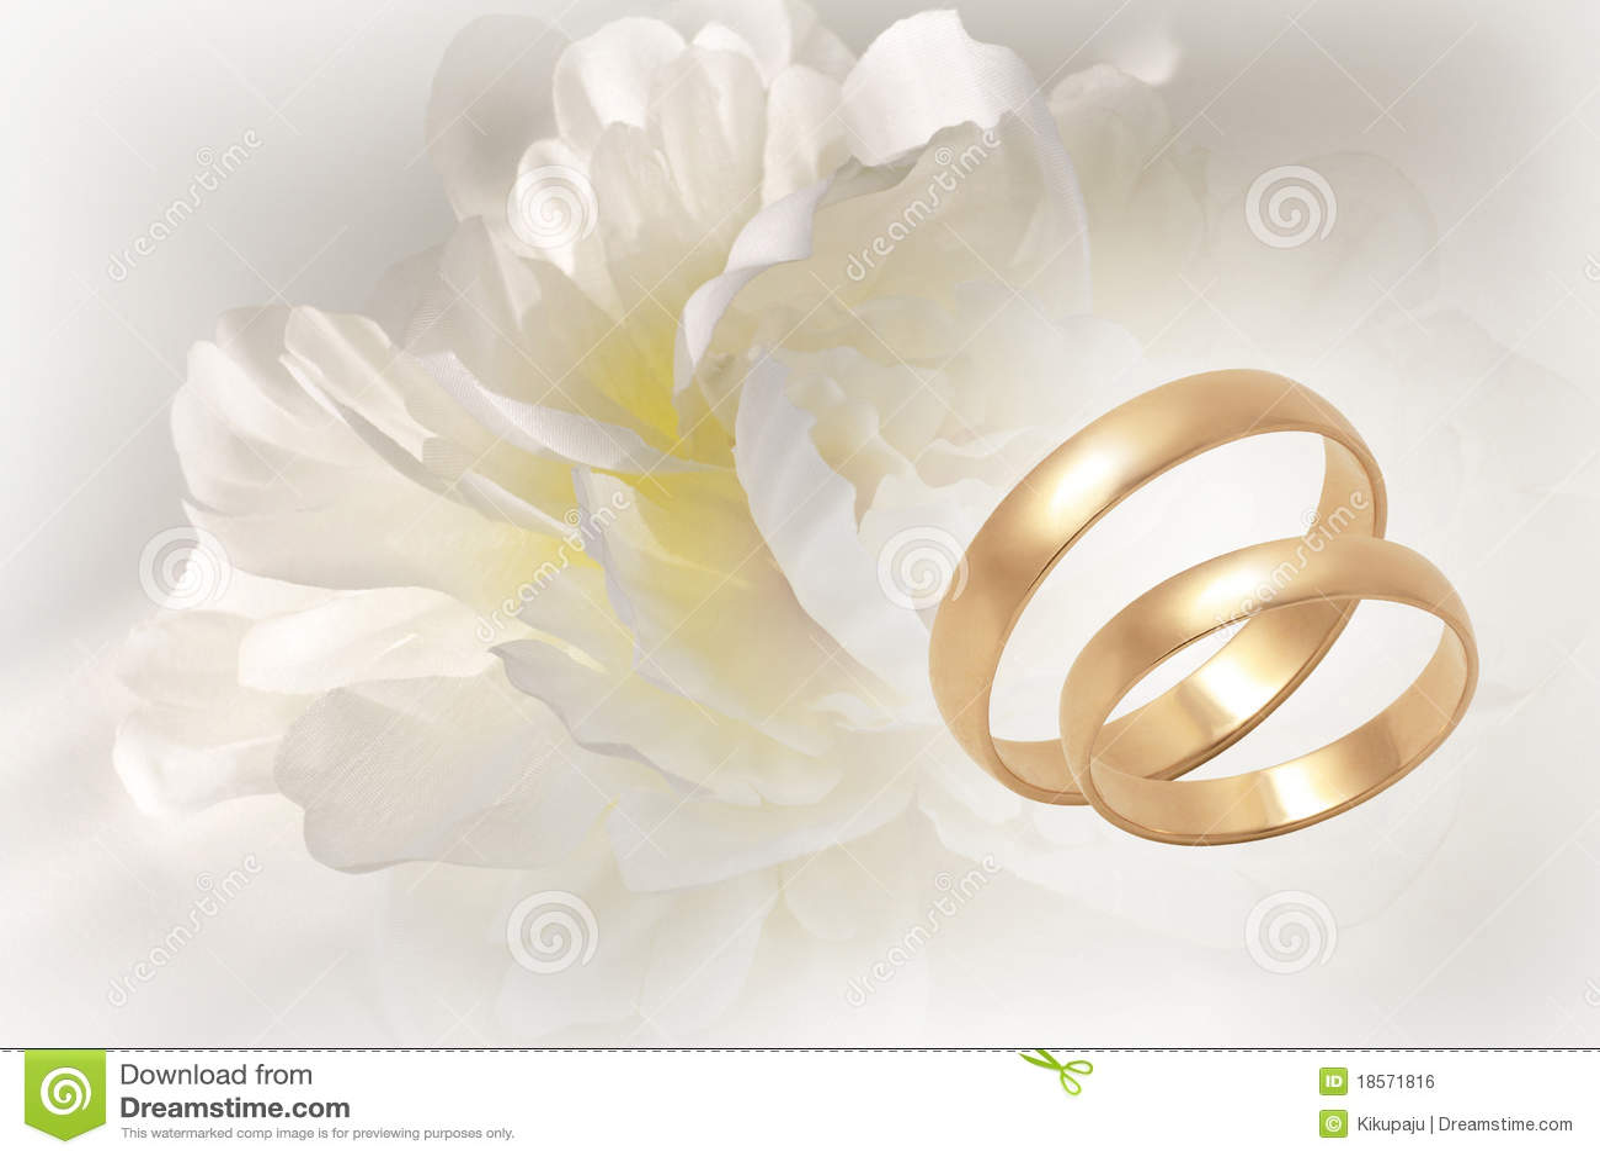 Gold wedding rings on flowery festive background stock - Cosas para preparar una boda ...